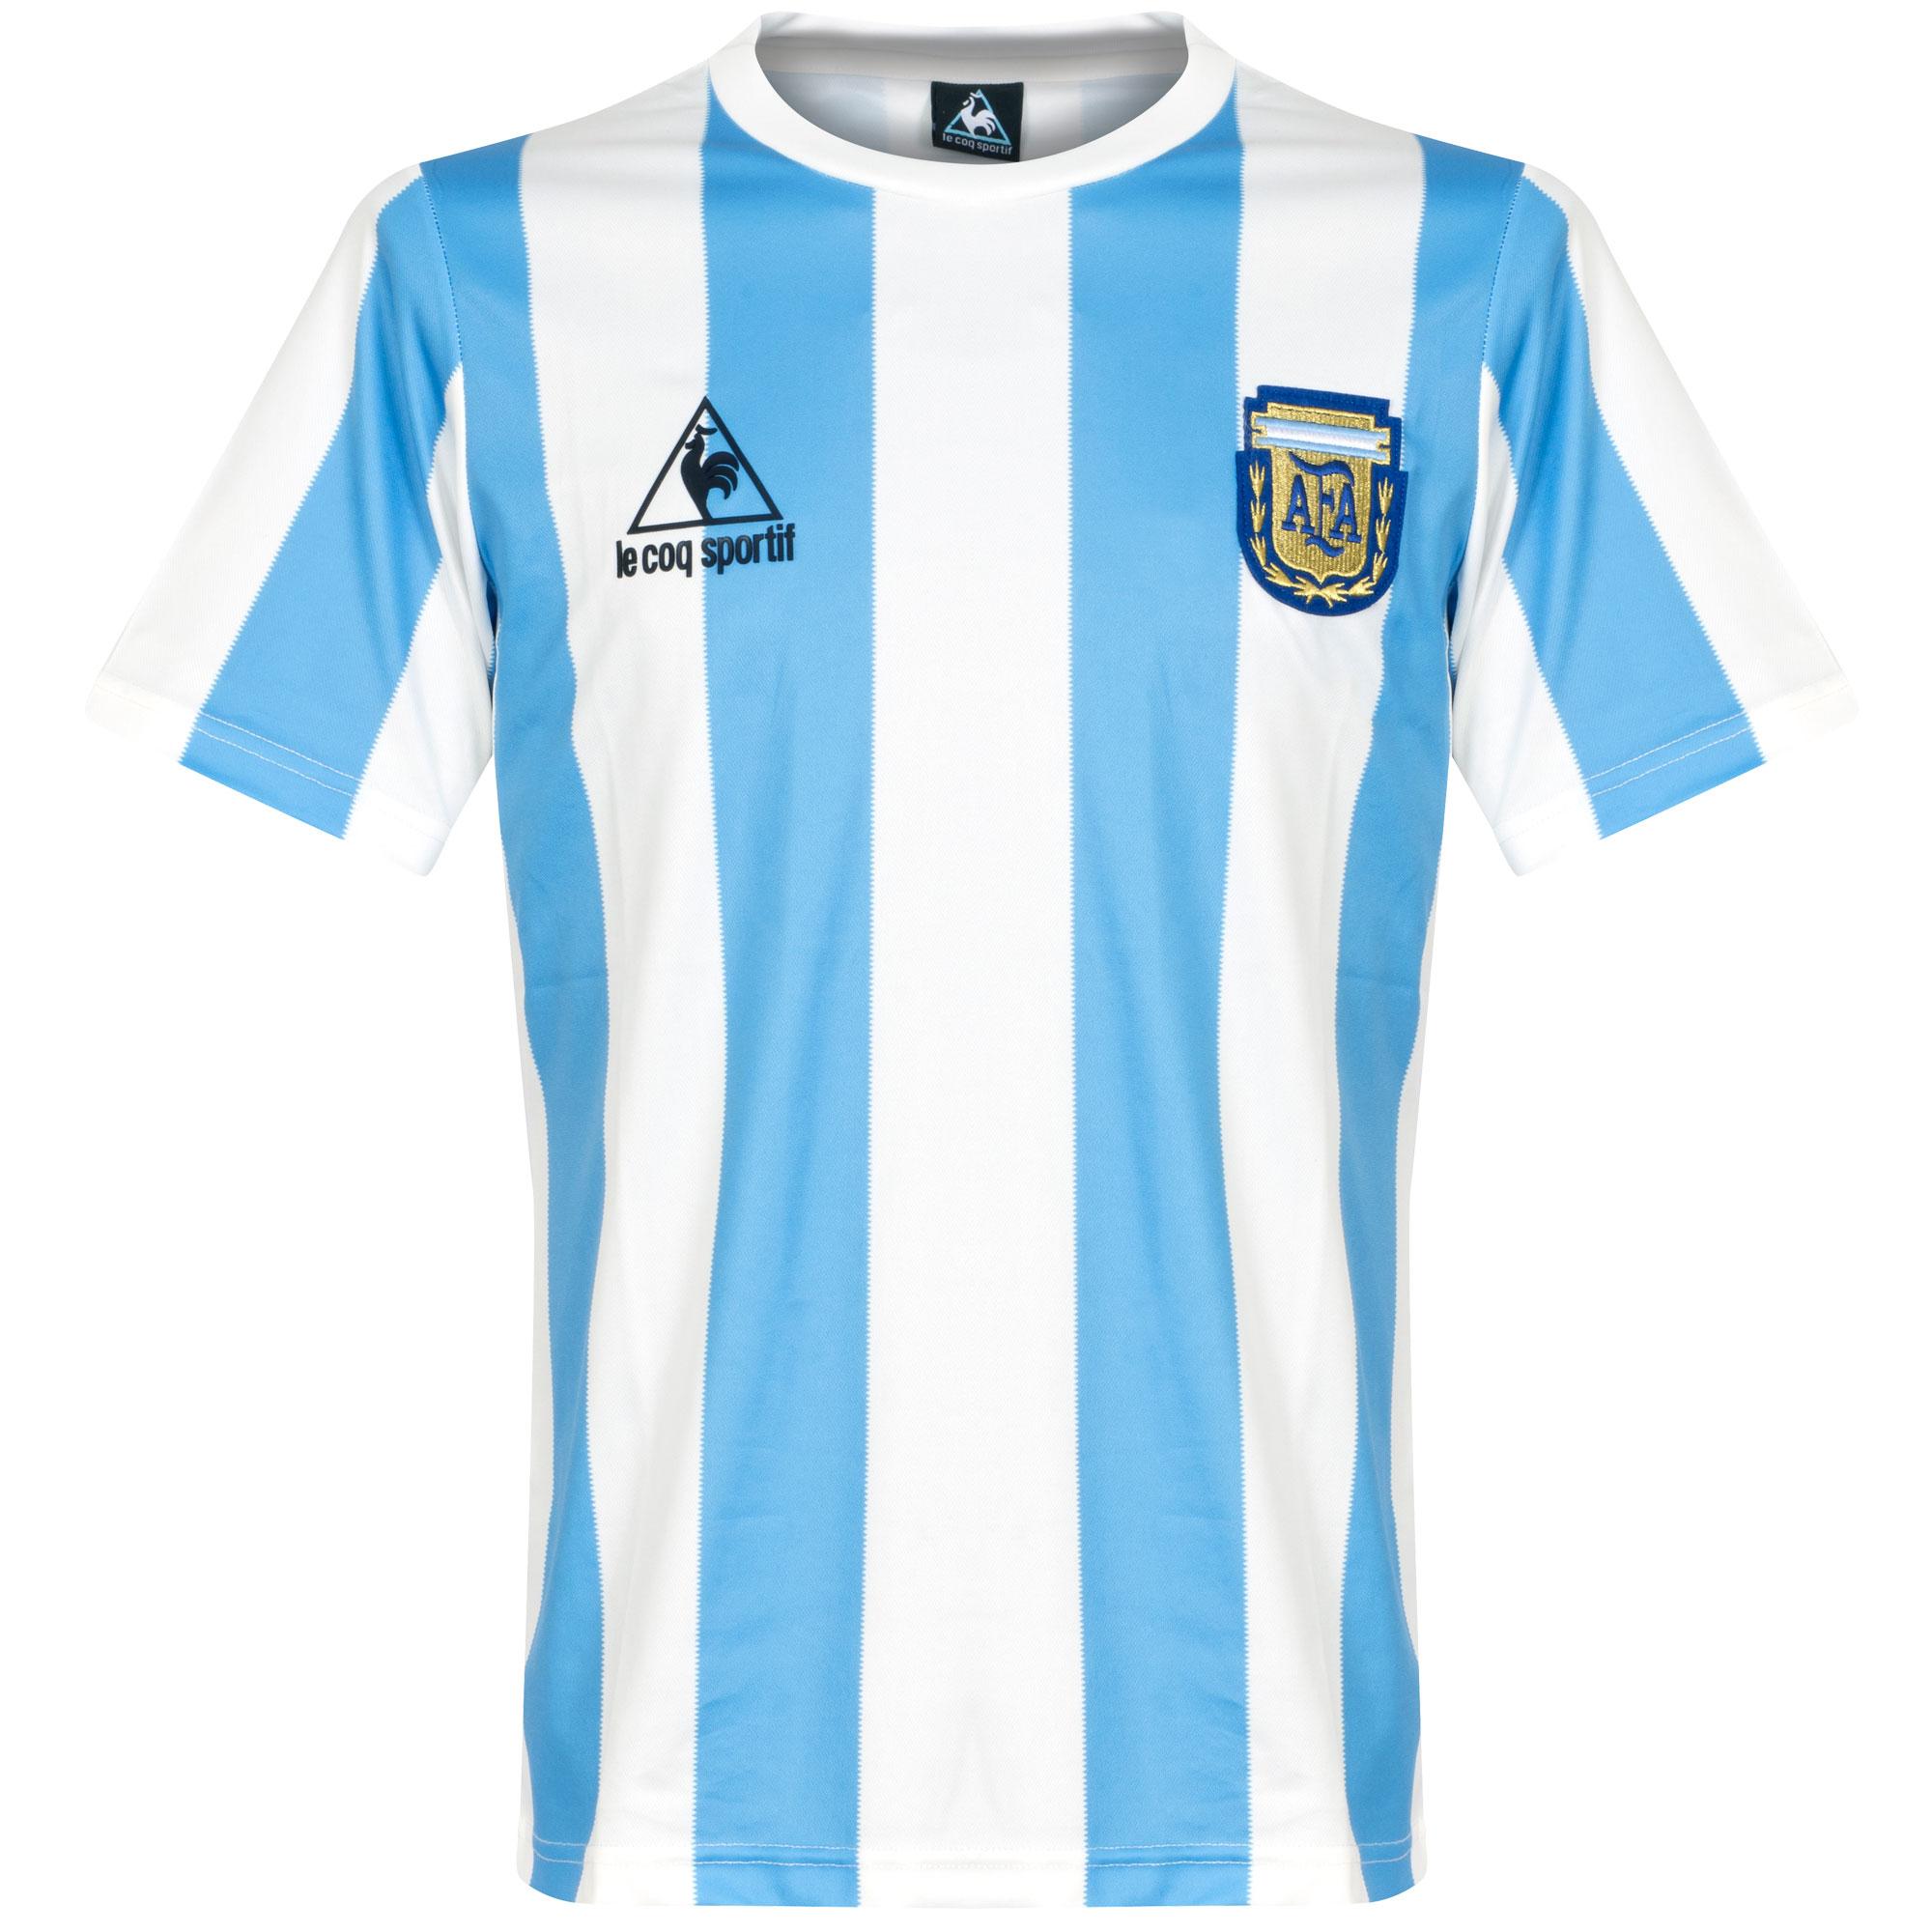 80feb4b6f70 Retro Argentina Football Shirts